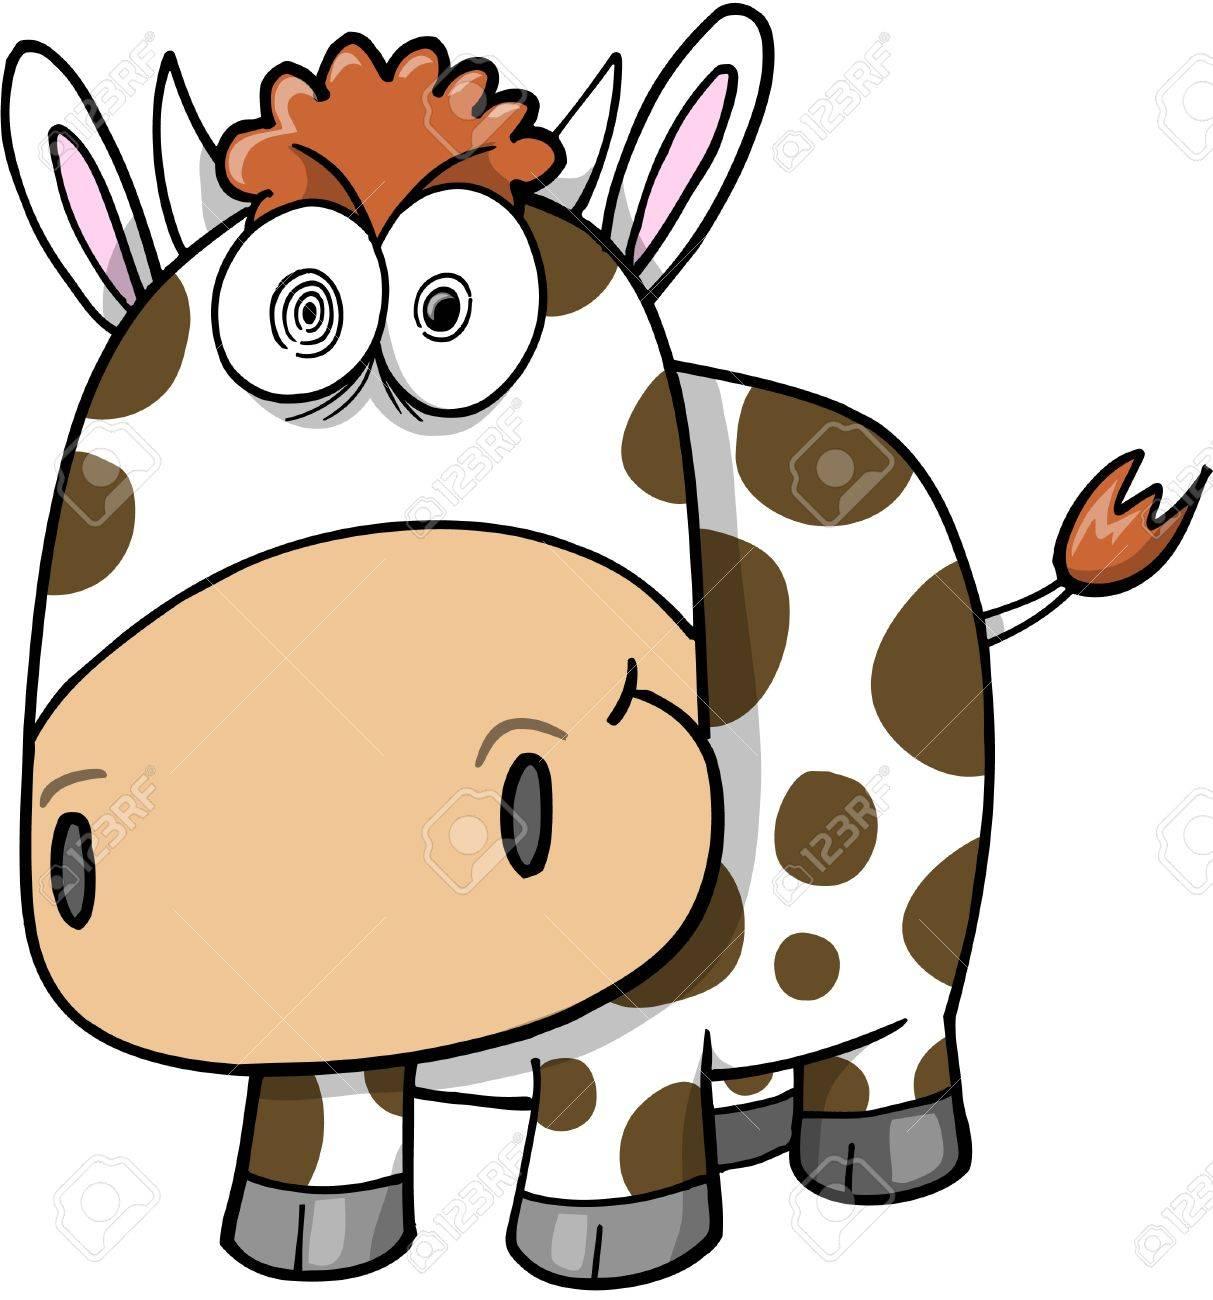 Crazy Insane Cow Illustration - 11546826